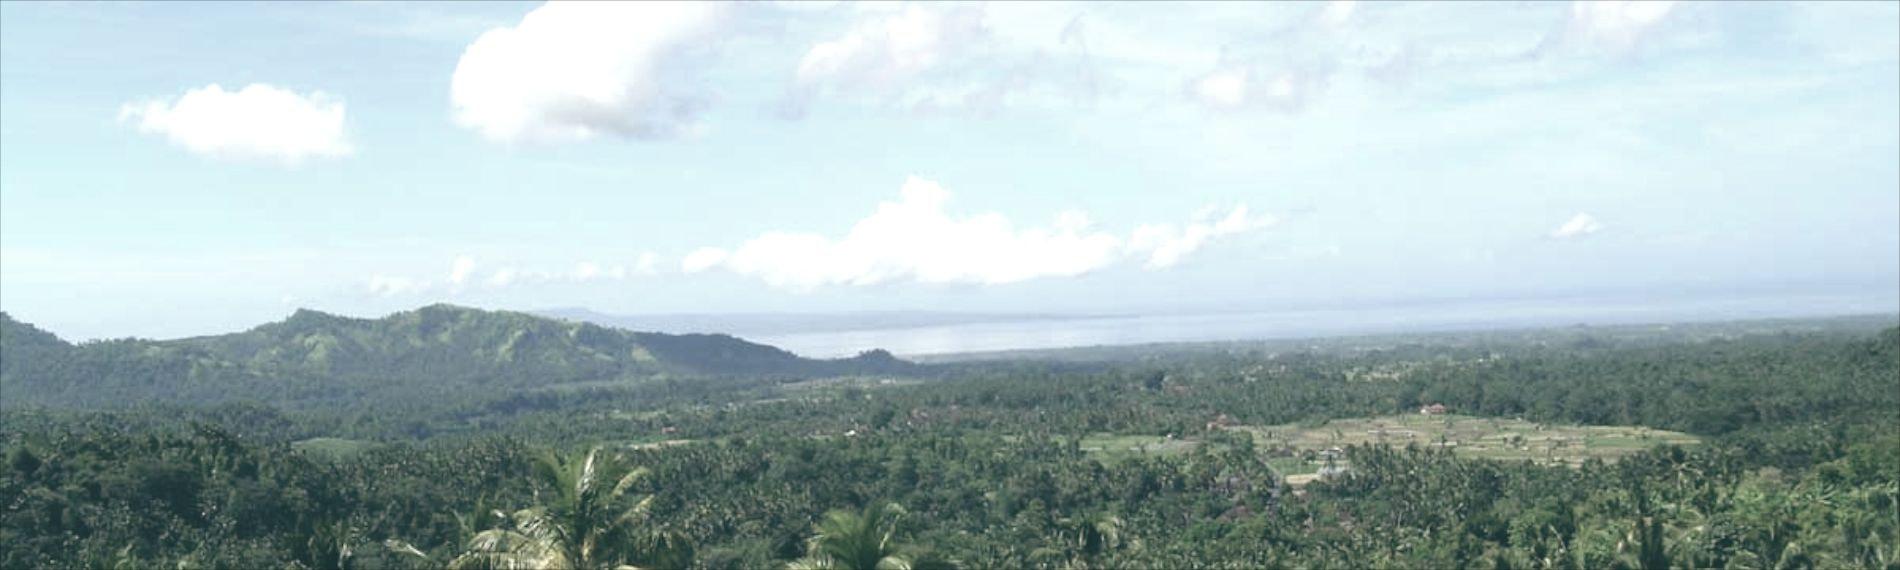 https://mlcb8szwyxfv.i.optimole.com/tTCGqh8-oDyPefMt/w:auto/h:auto/q:90/https://www.uniqueteambuilding.com.au/wp-content/uploads/2014/10/Bali-retreat-rot-2.jpg